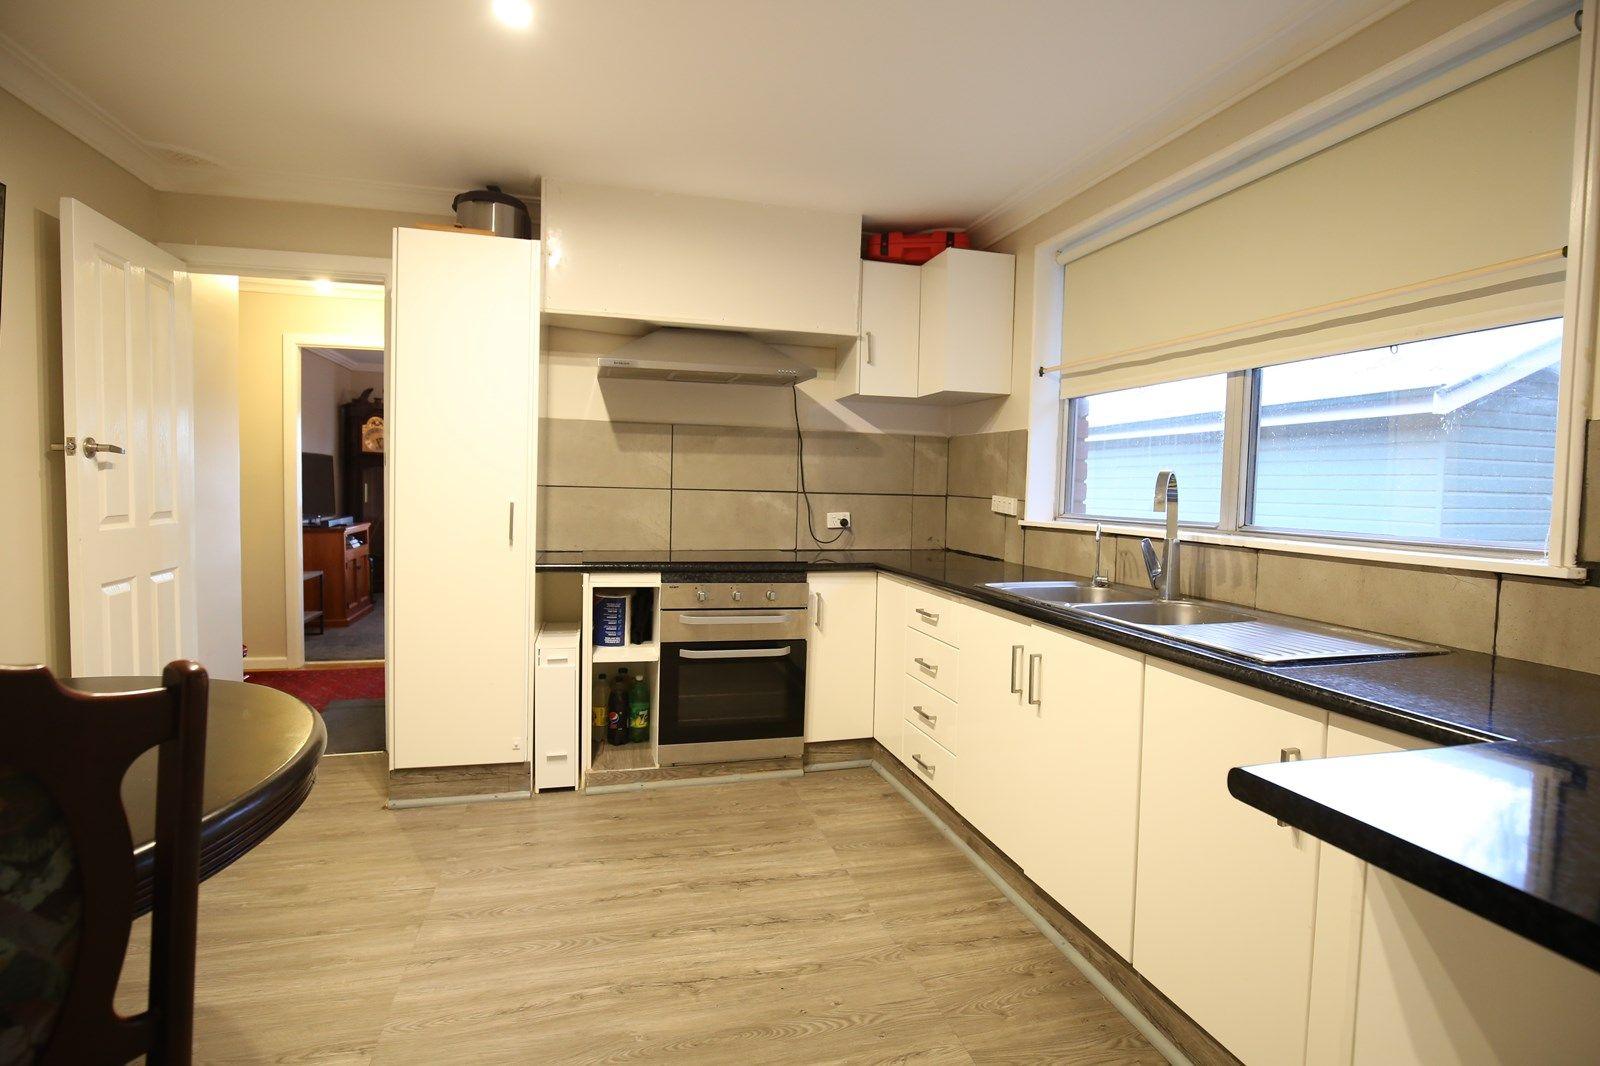 341 PEISLEY STREET, Orange NSW 2800, Image 1